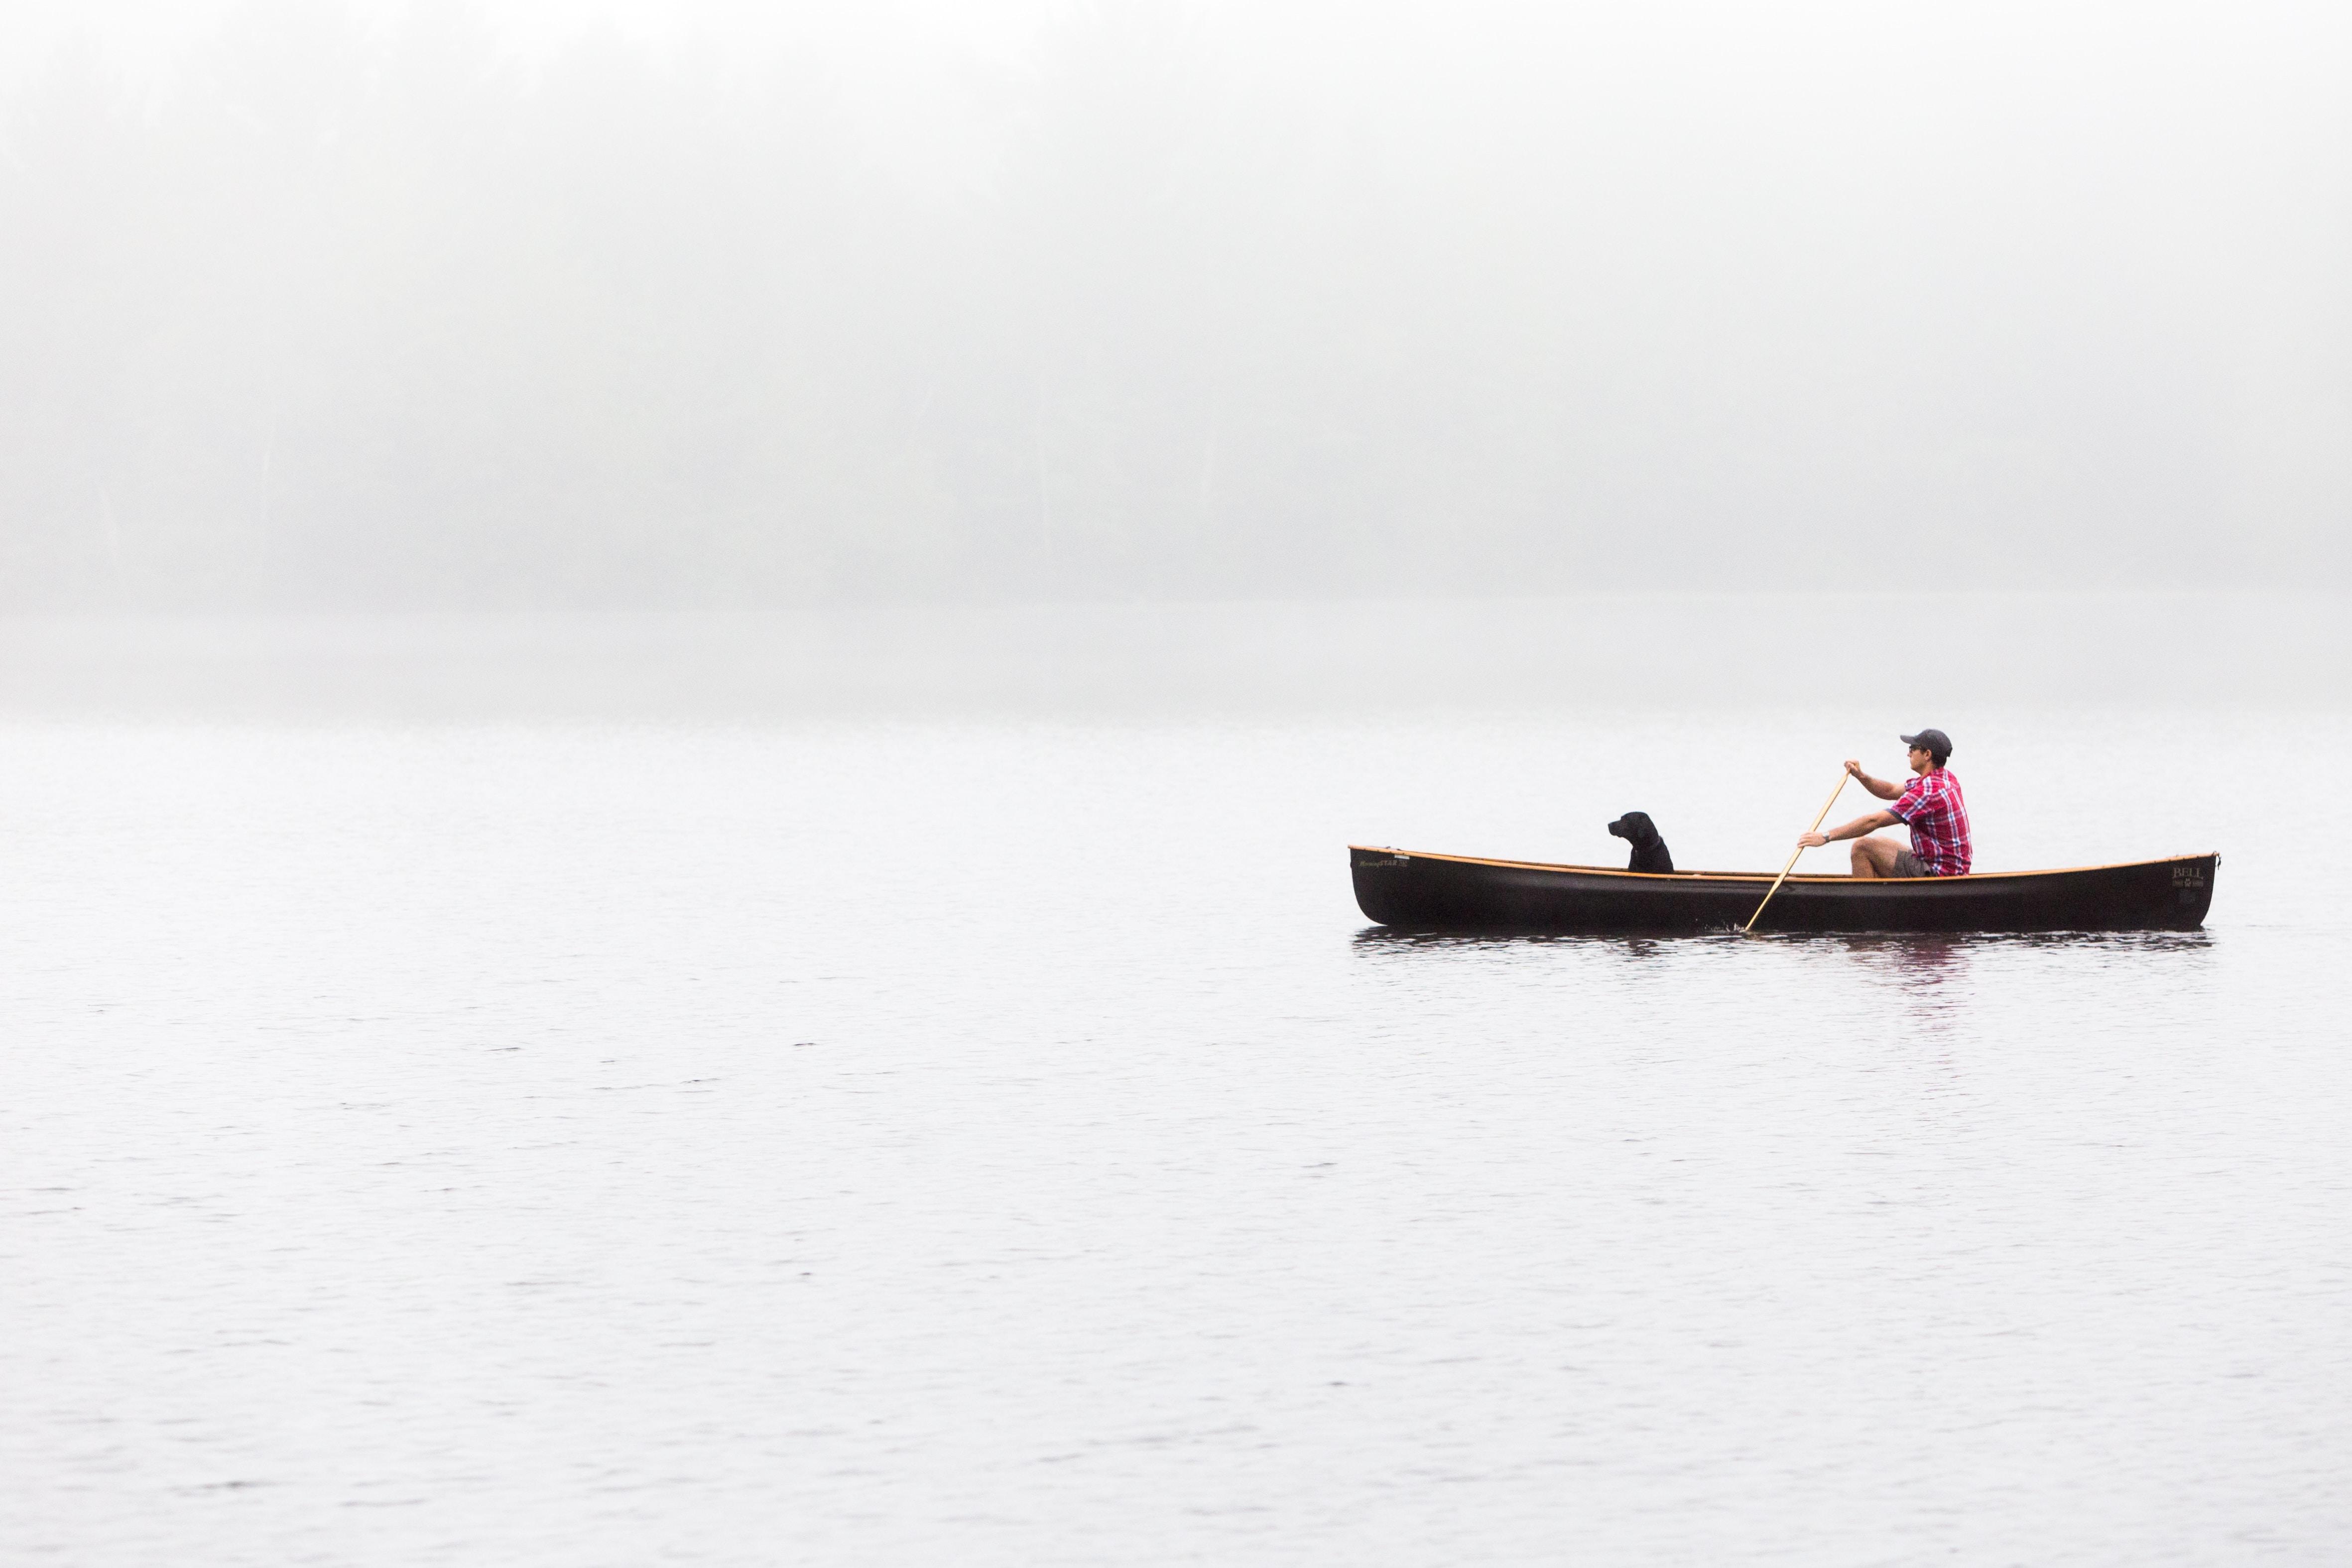 landscape photography man with black dog riding boat on lake